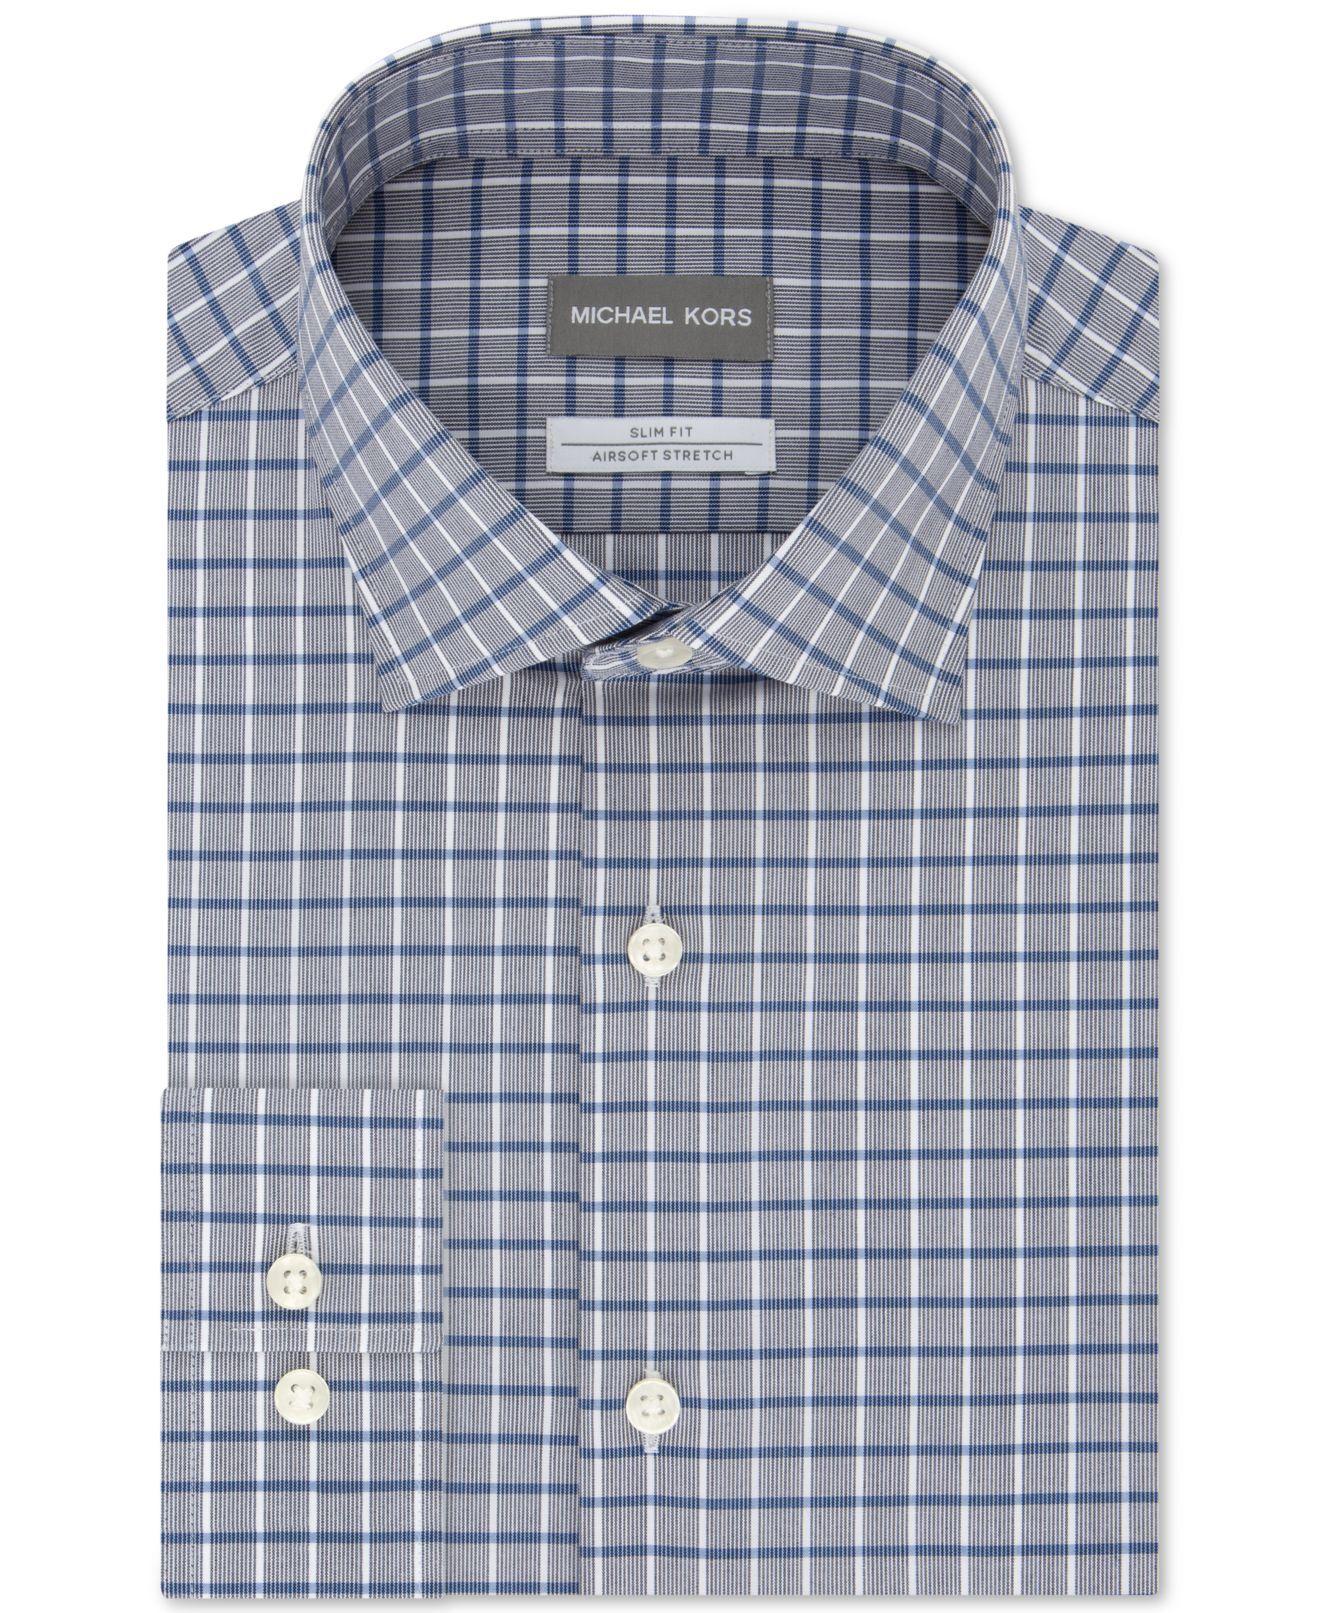 Michael Kors Men Dresss Shirt Gray Size 15 1/2 Plaid Collar Button Down